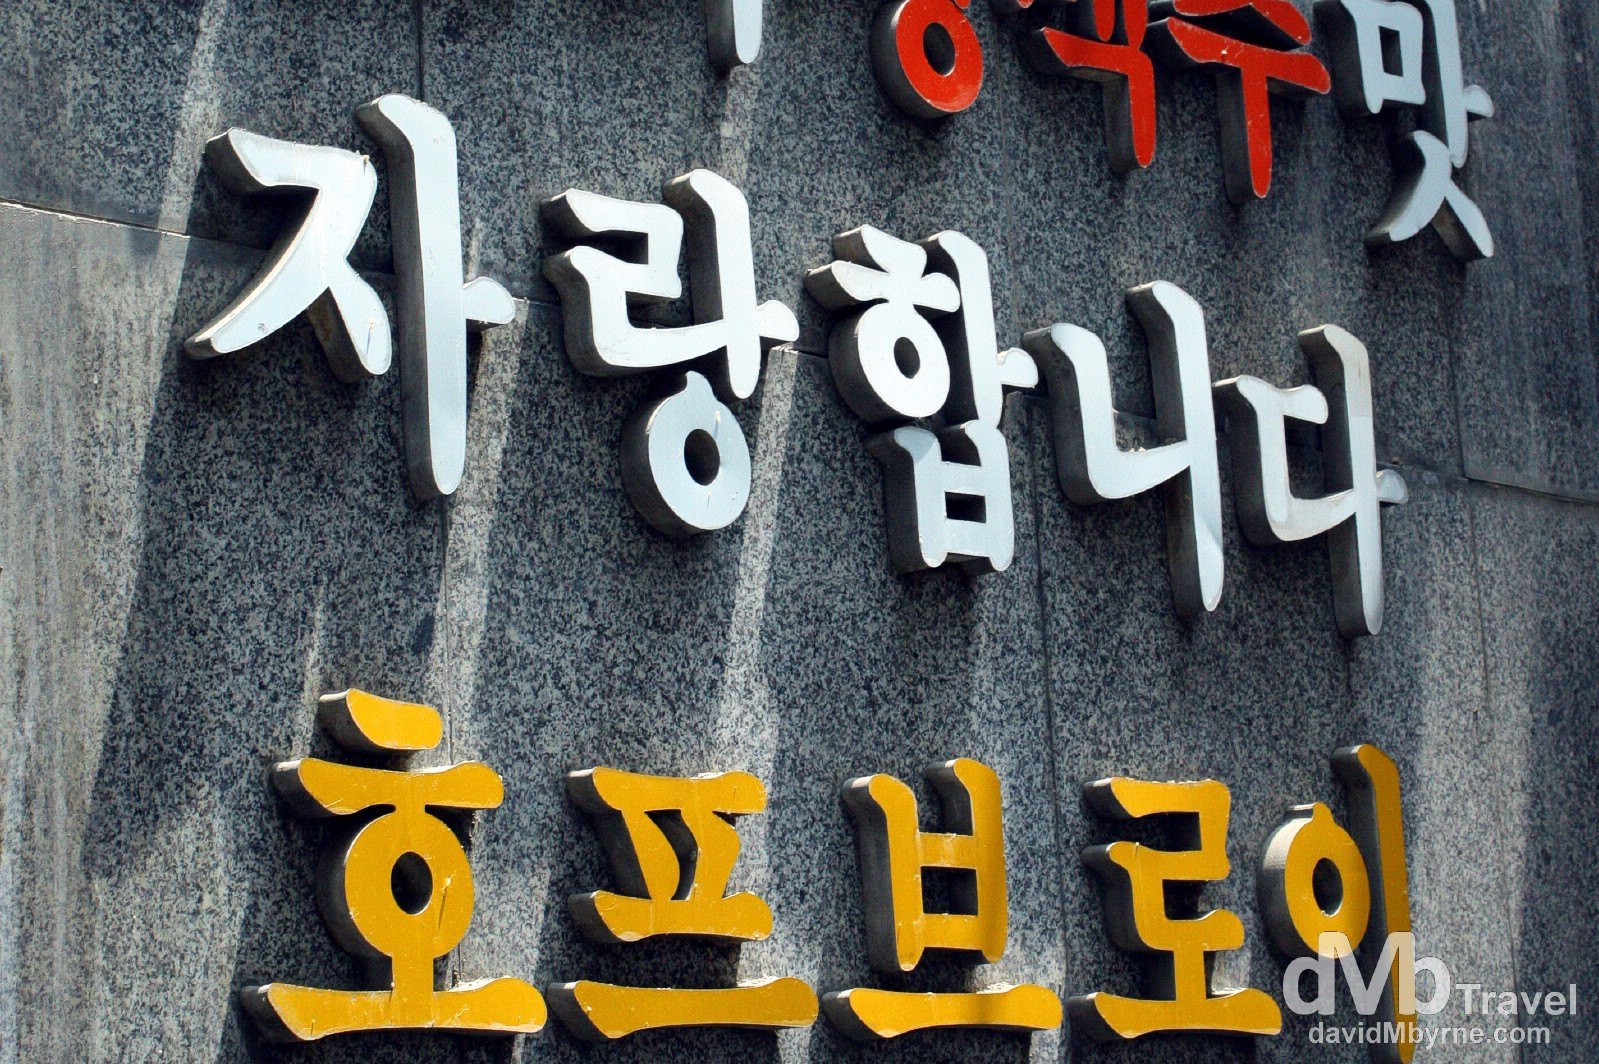 Hangul, Korean script, on the streets of Seoul, South Korea. July 8, 2008.